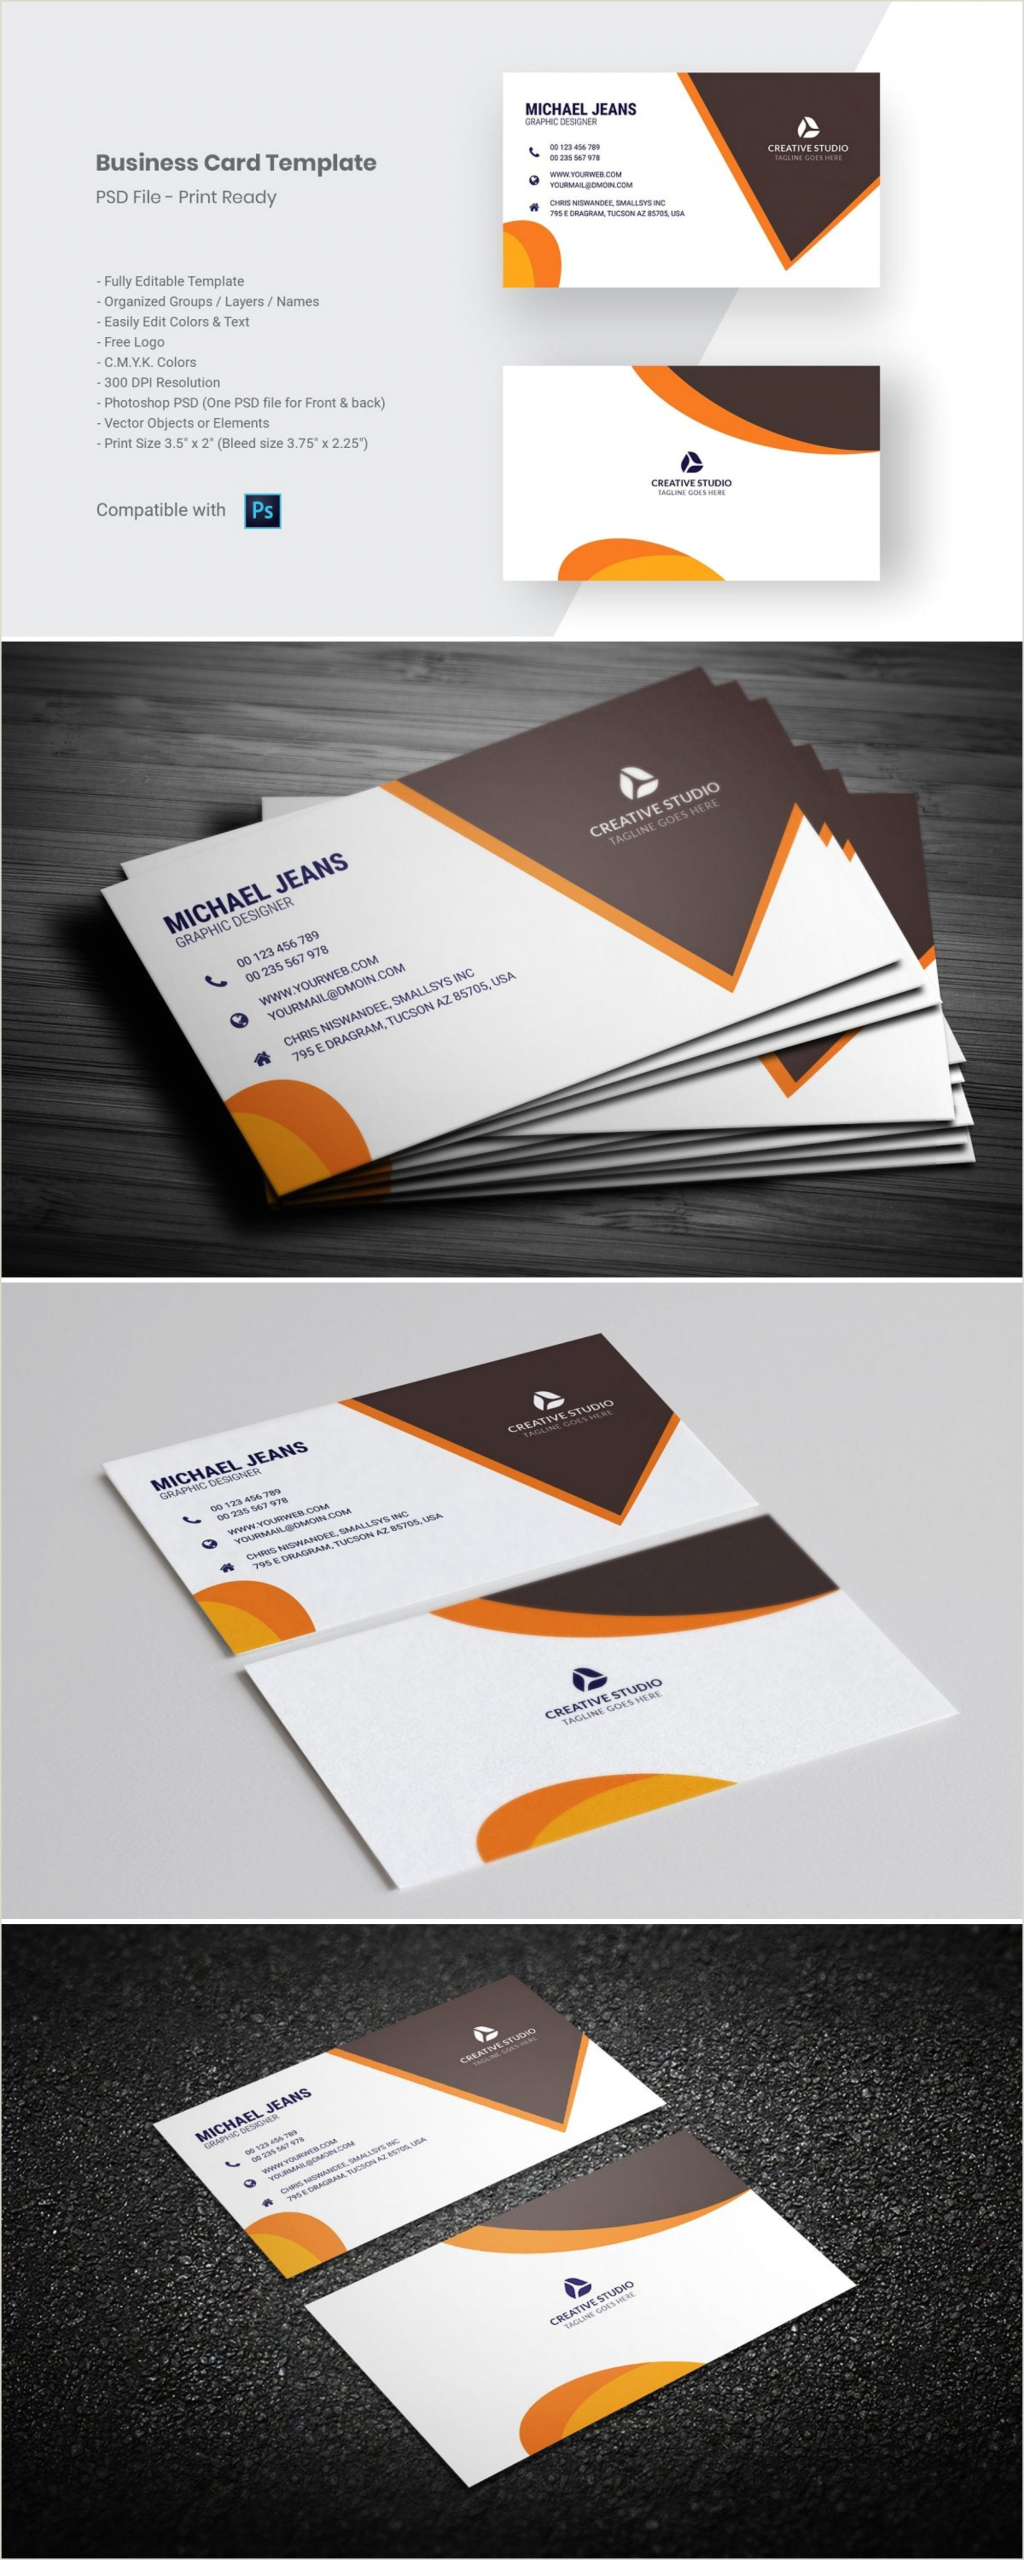 Professional Business Card Design Modern Business Card Template